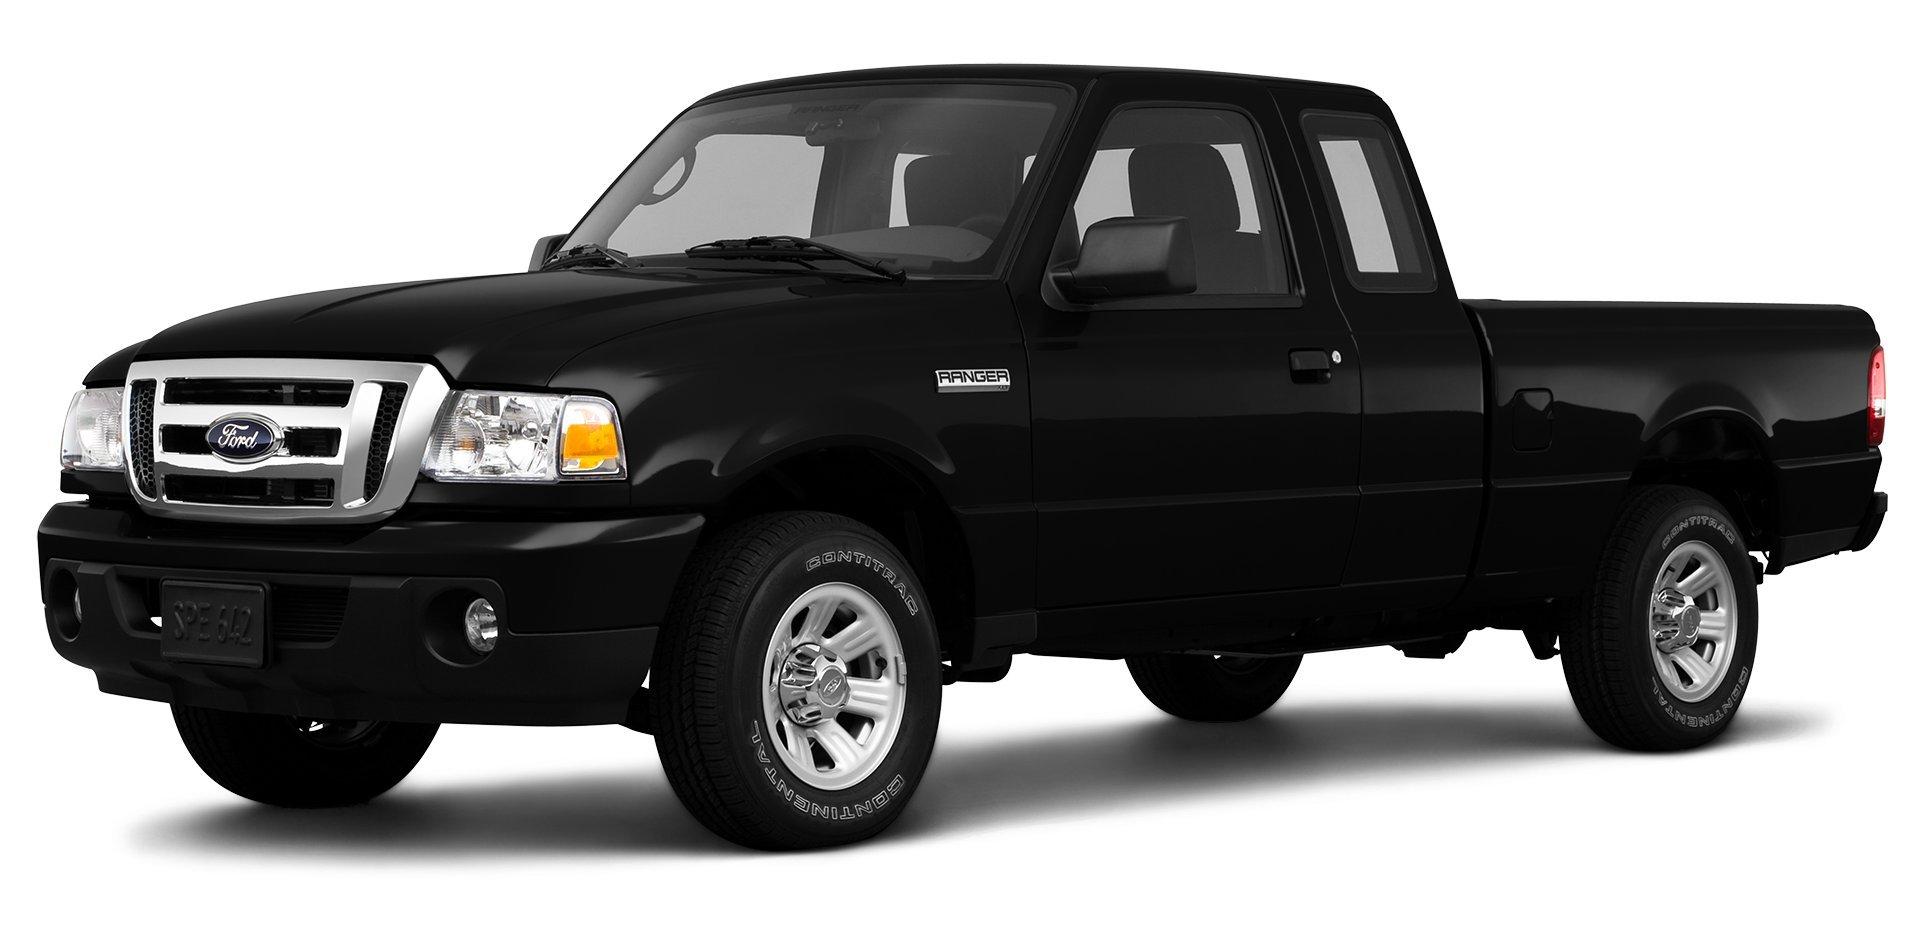 2010 ford ranger reviews images and specs vehicles. Black Bedroom Furniture Sets. Home Design Ideas